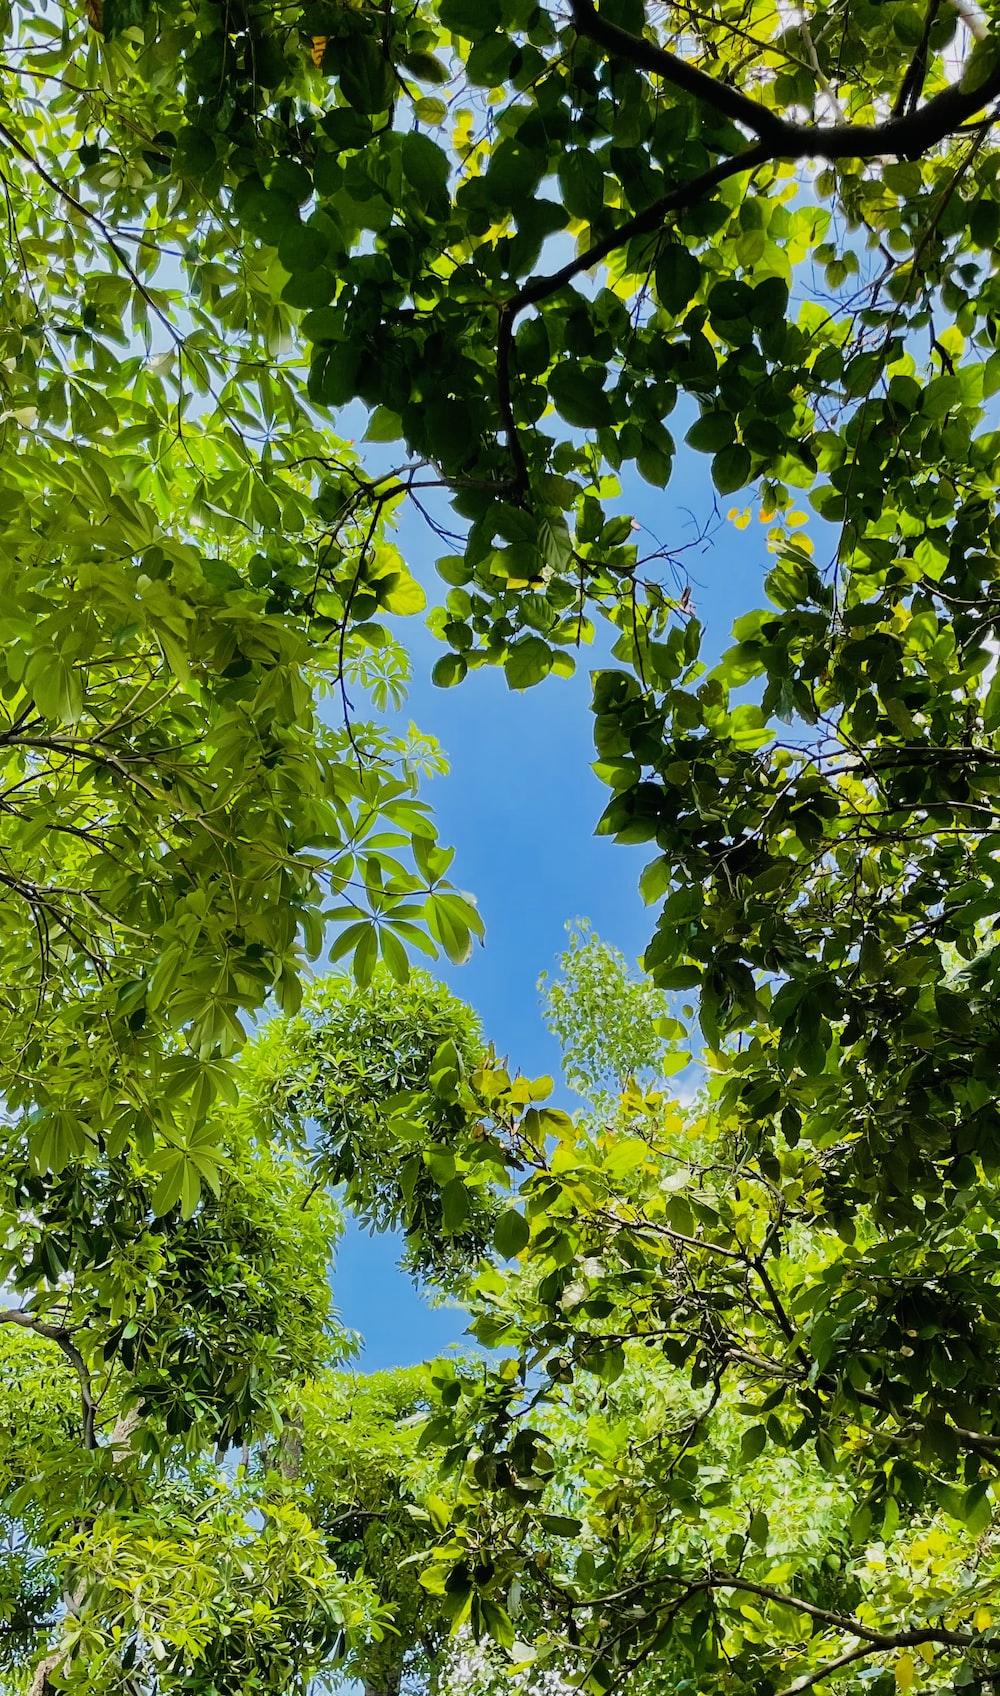 green leaves under blue sky during daytime